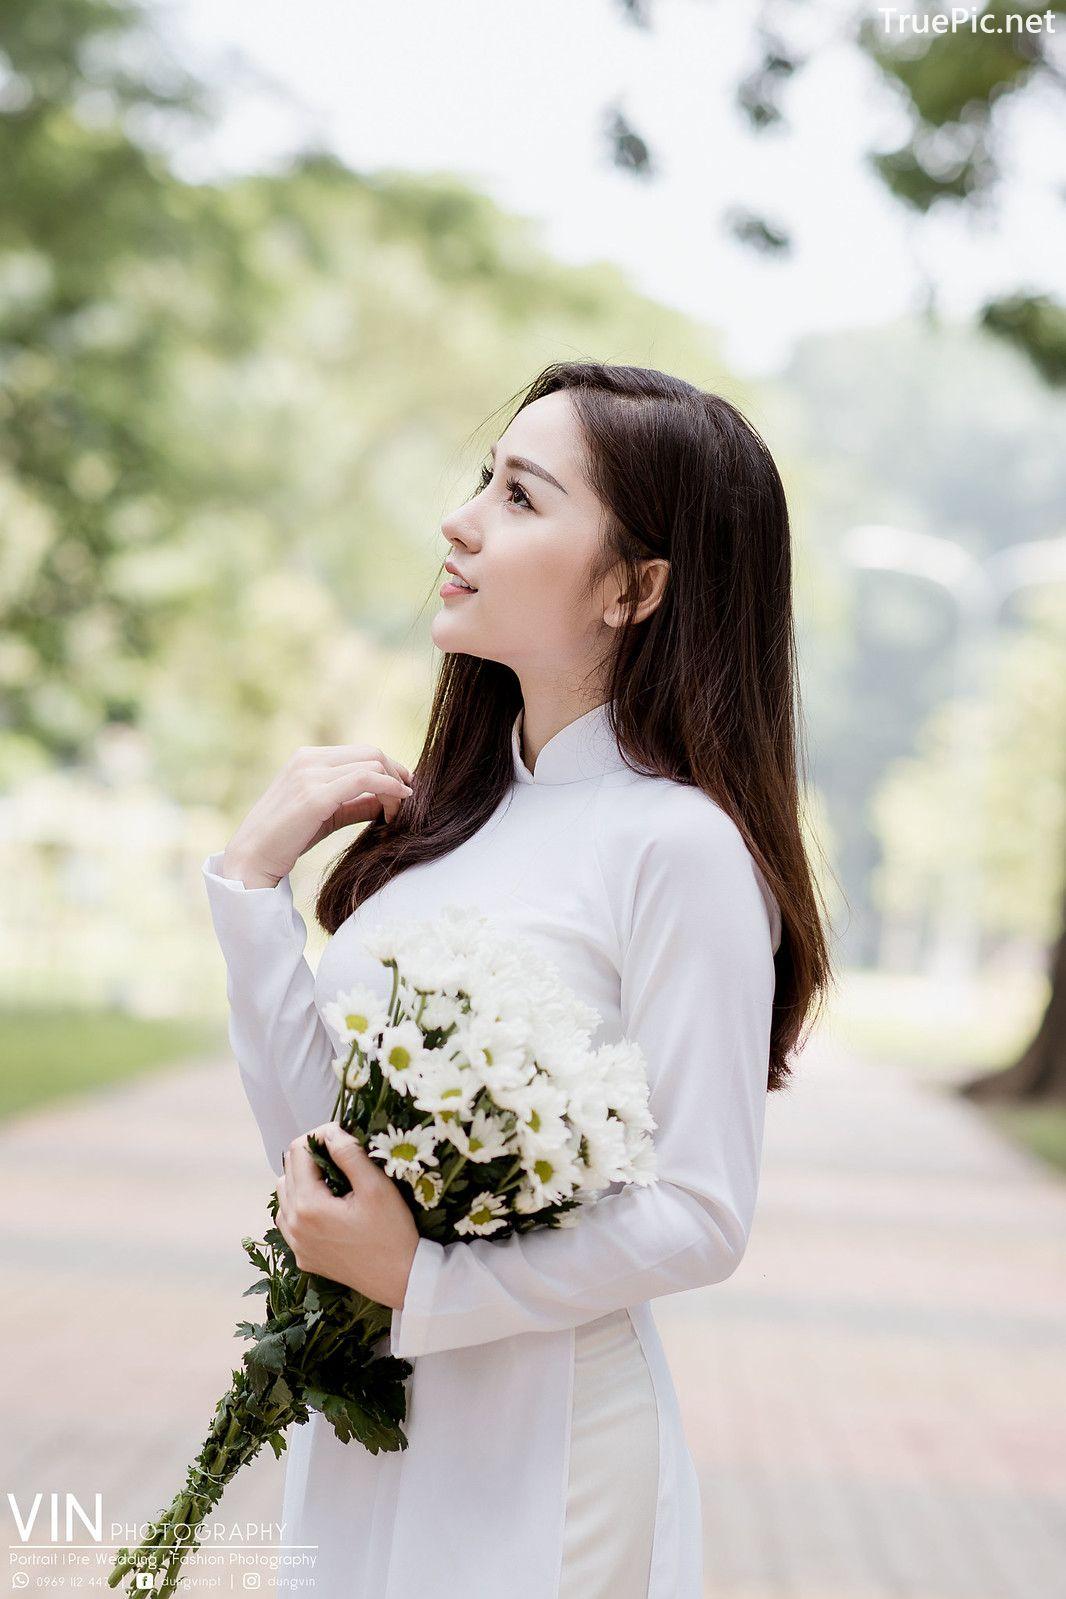 Vietnamese girls are so beautiful? - Vietnam Answer